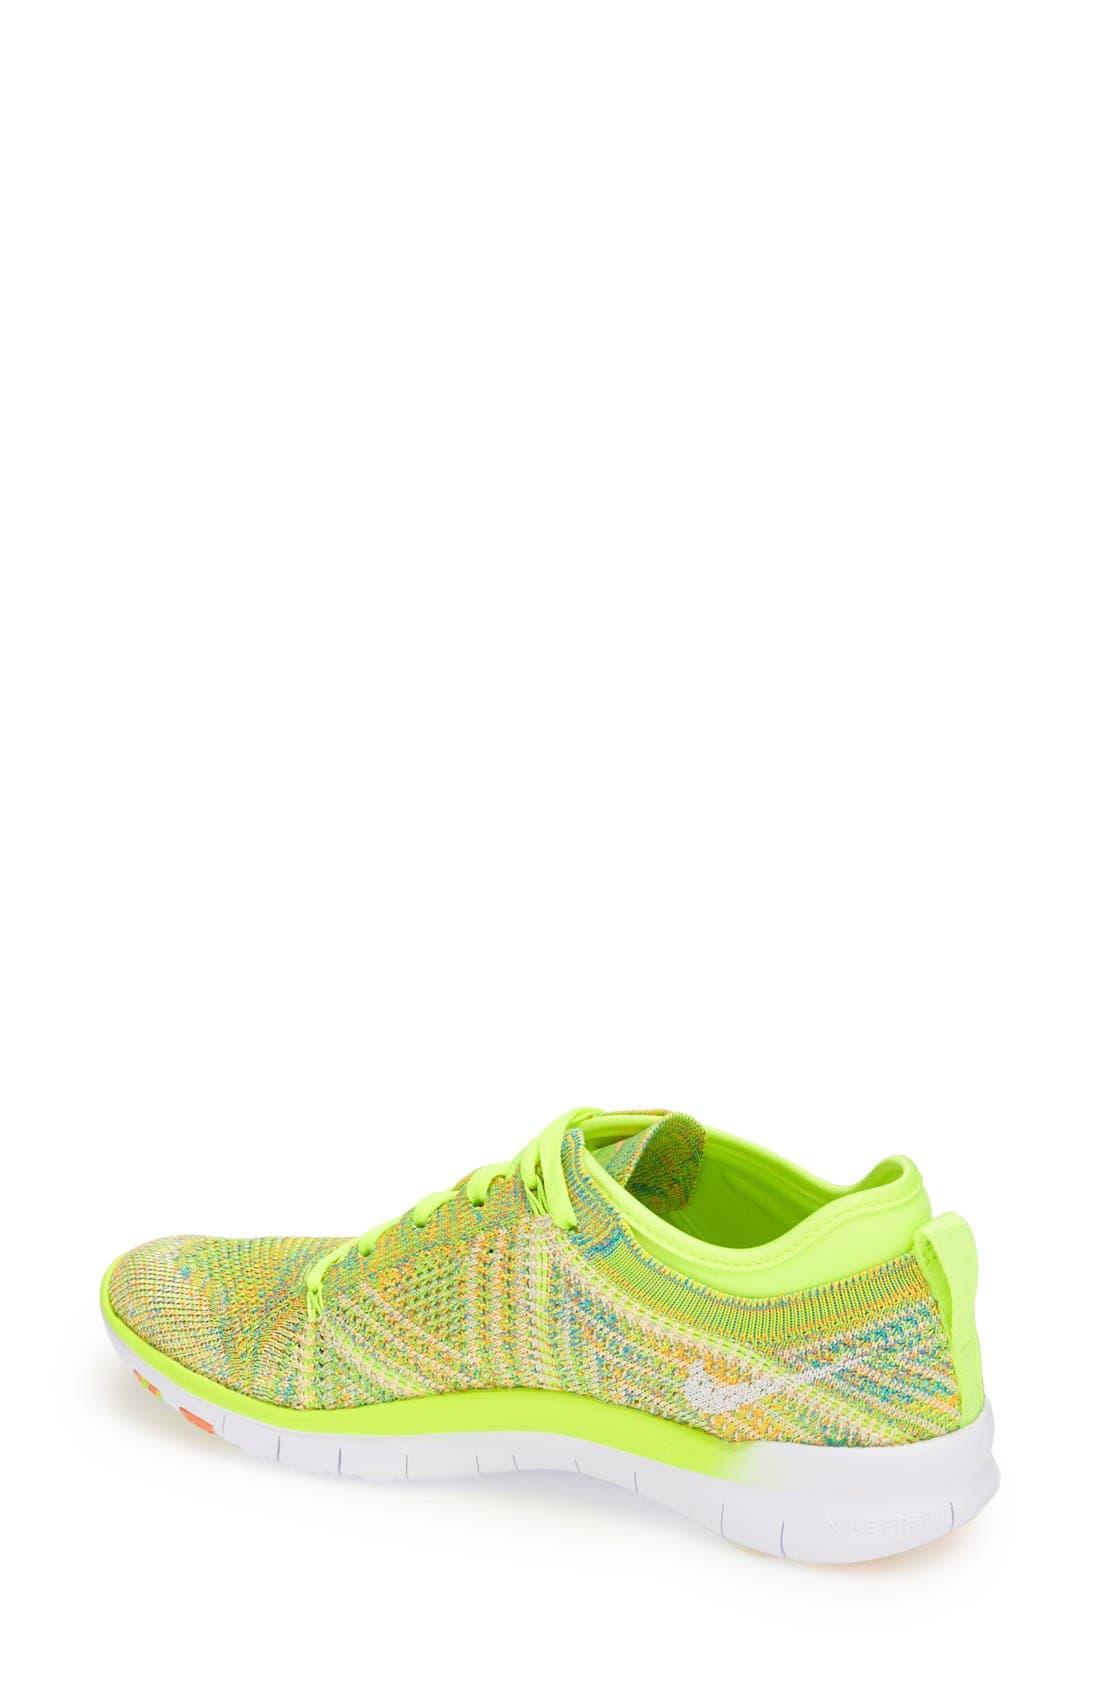 ,                             'Free Flyknit 5.0 TR' Training Shoe,                             Alternate thumbnail 54, color,                             700